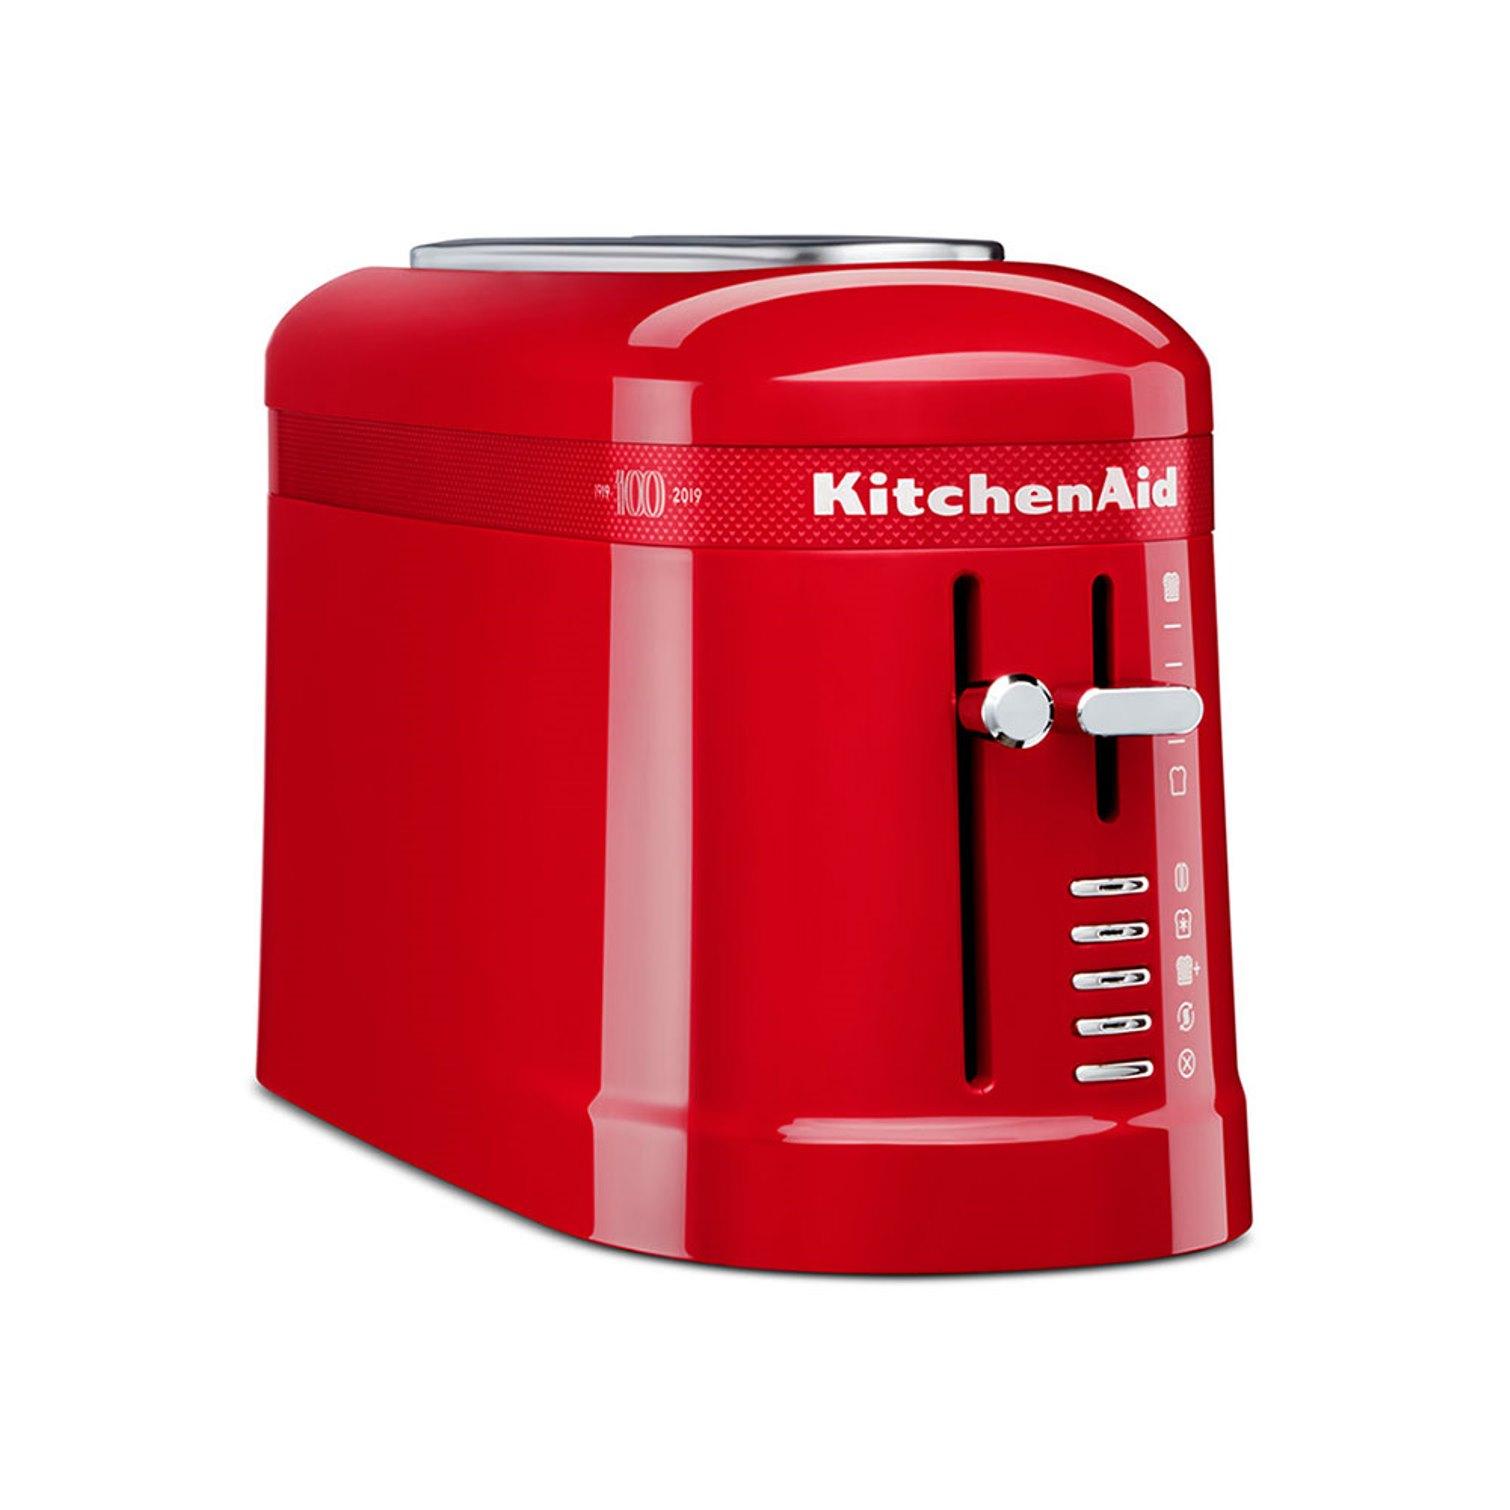 Онлайн каталог PROMENU: Тостер на один слот (два ломтика) KitchenAid ARTISAN Queen of Hearts, 4 режима, 20х40х14 см, чувственный красный                               5KMT3115HESD